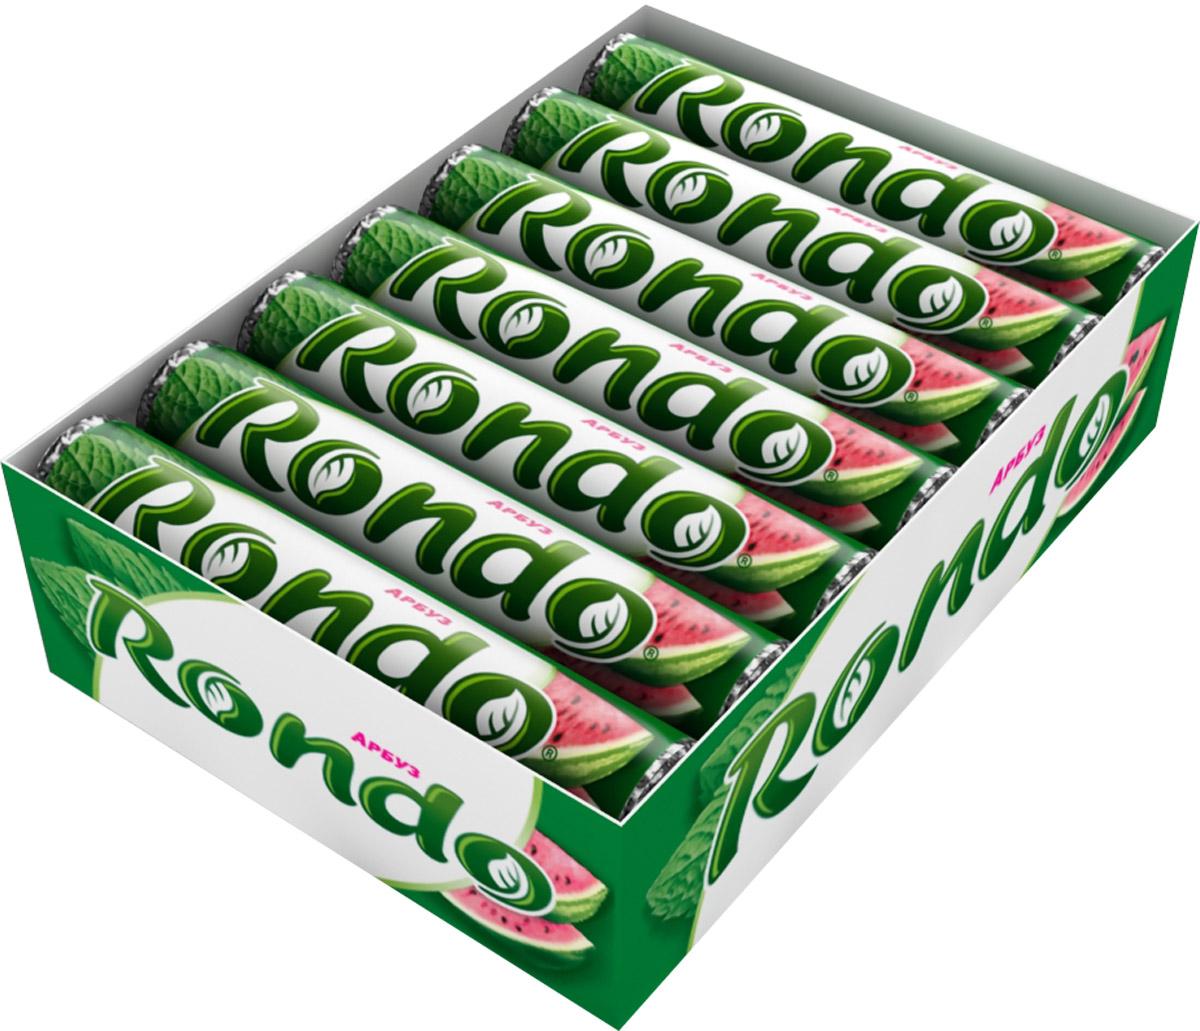 Rondo Арбуз освежающие конфеты, 14 пачек по 30 г освежающие конфеты rondo мята 30г